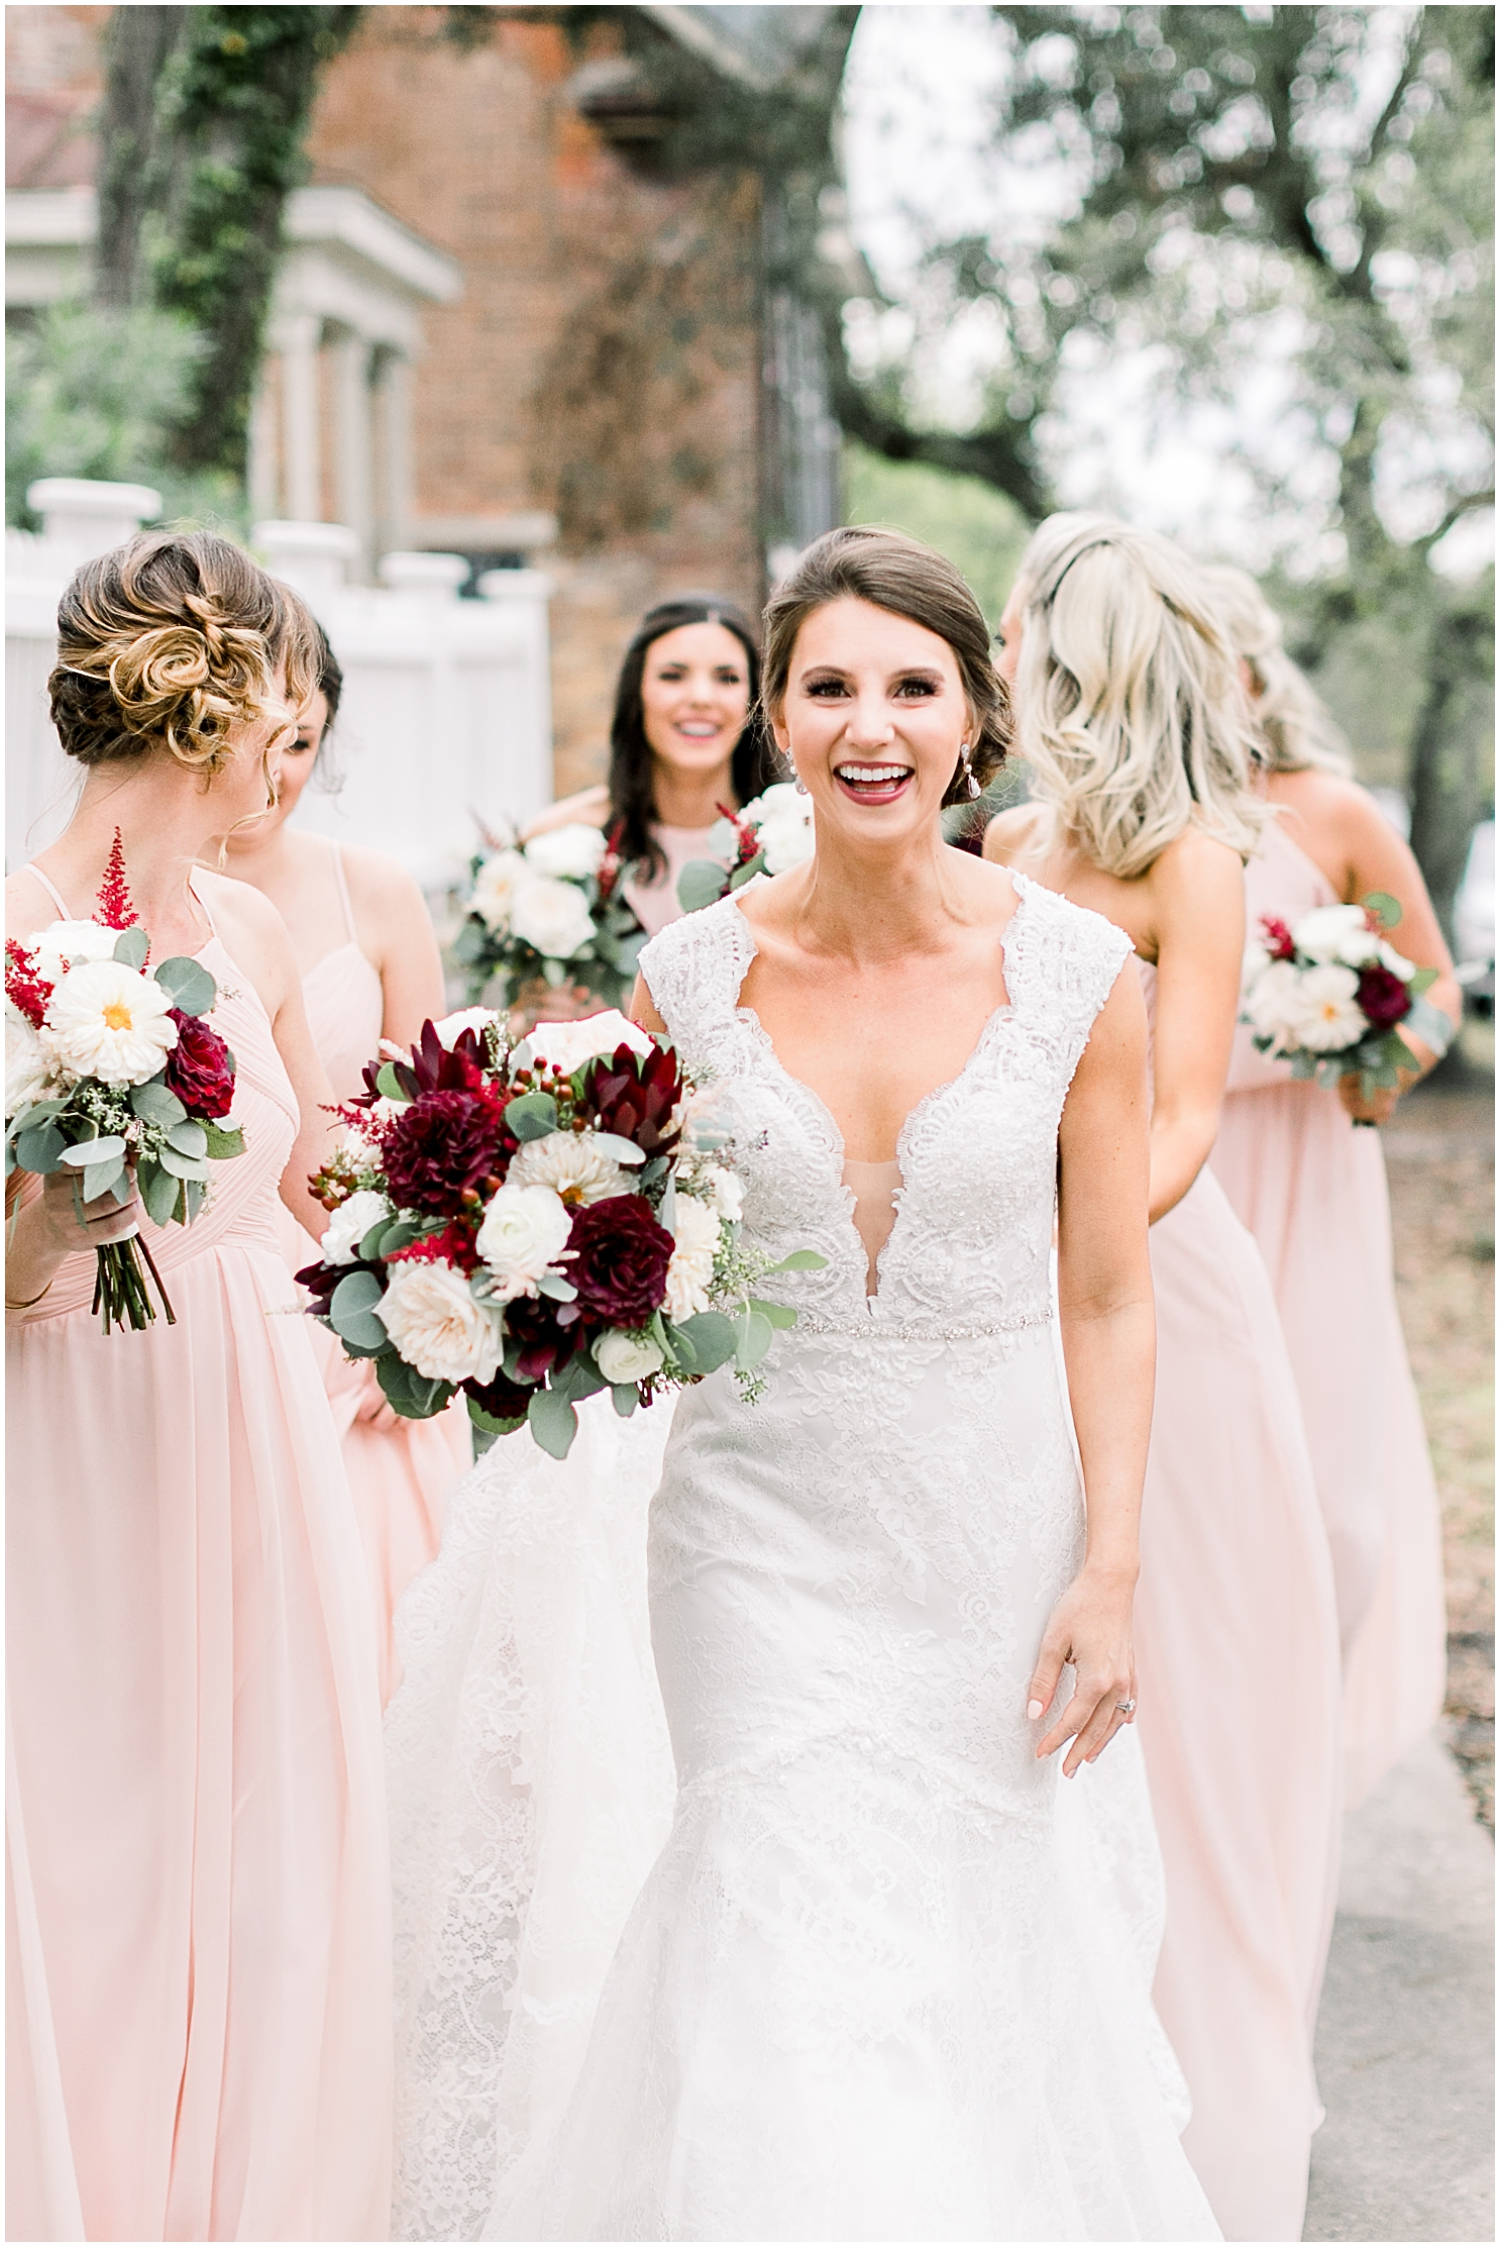 128 South Wedding venue, Downtown Wilmington NC Wedding_Erin L. Taylor Photography_0010.jpg